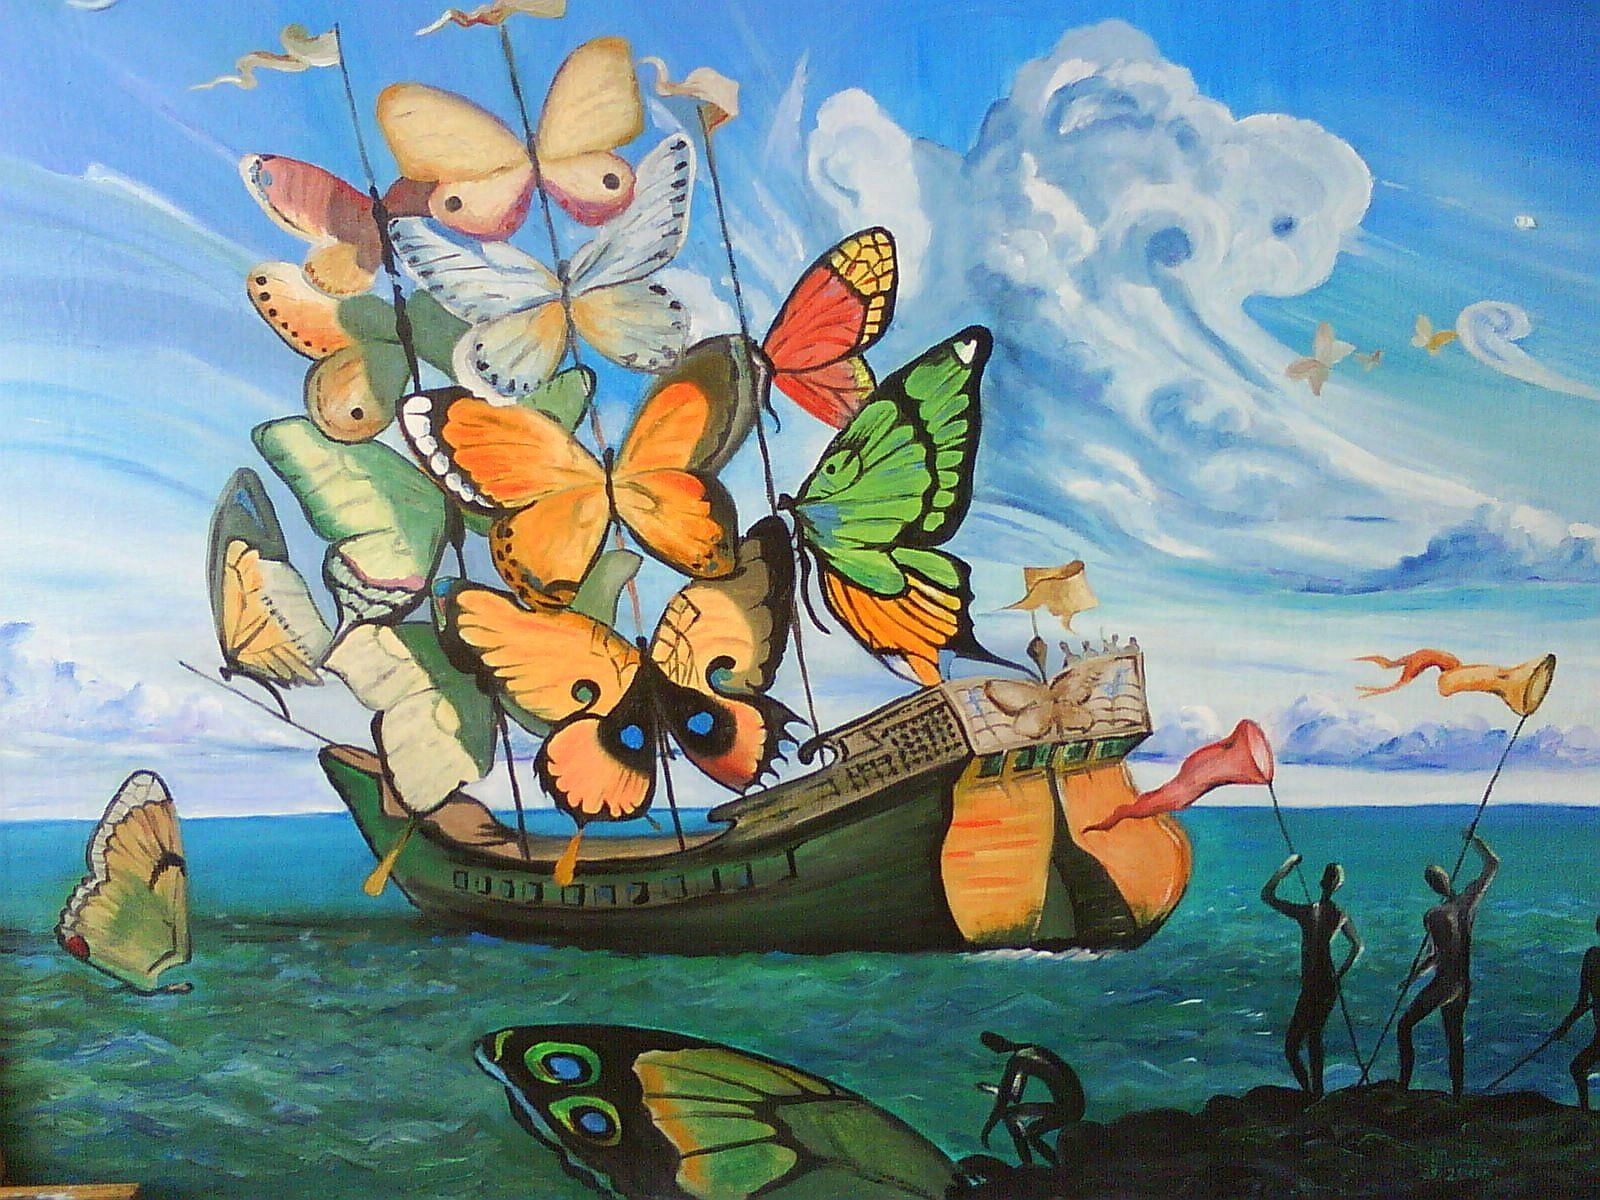 salvador dali painting - Google Search | interest | Pinterest ...